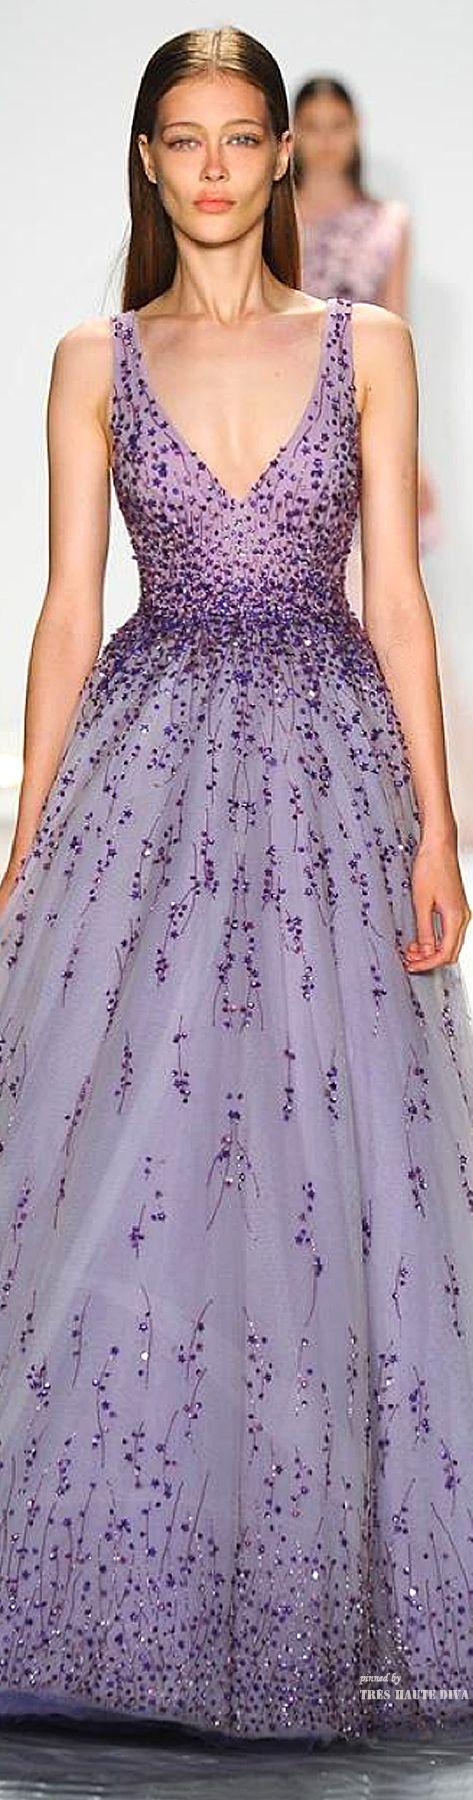 Gorgeous dress for Lavender theme wedding reception. NYFW Monique L'huillier Spring 2015 RTW